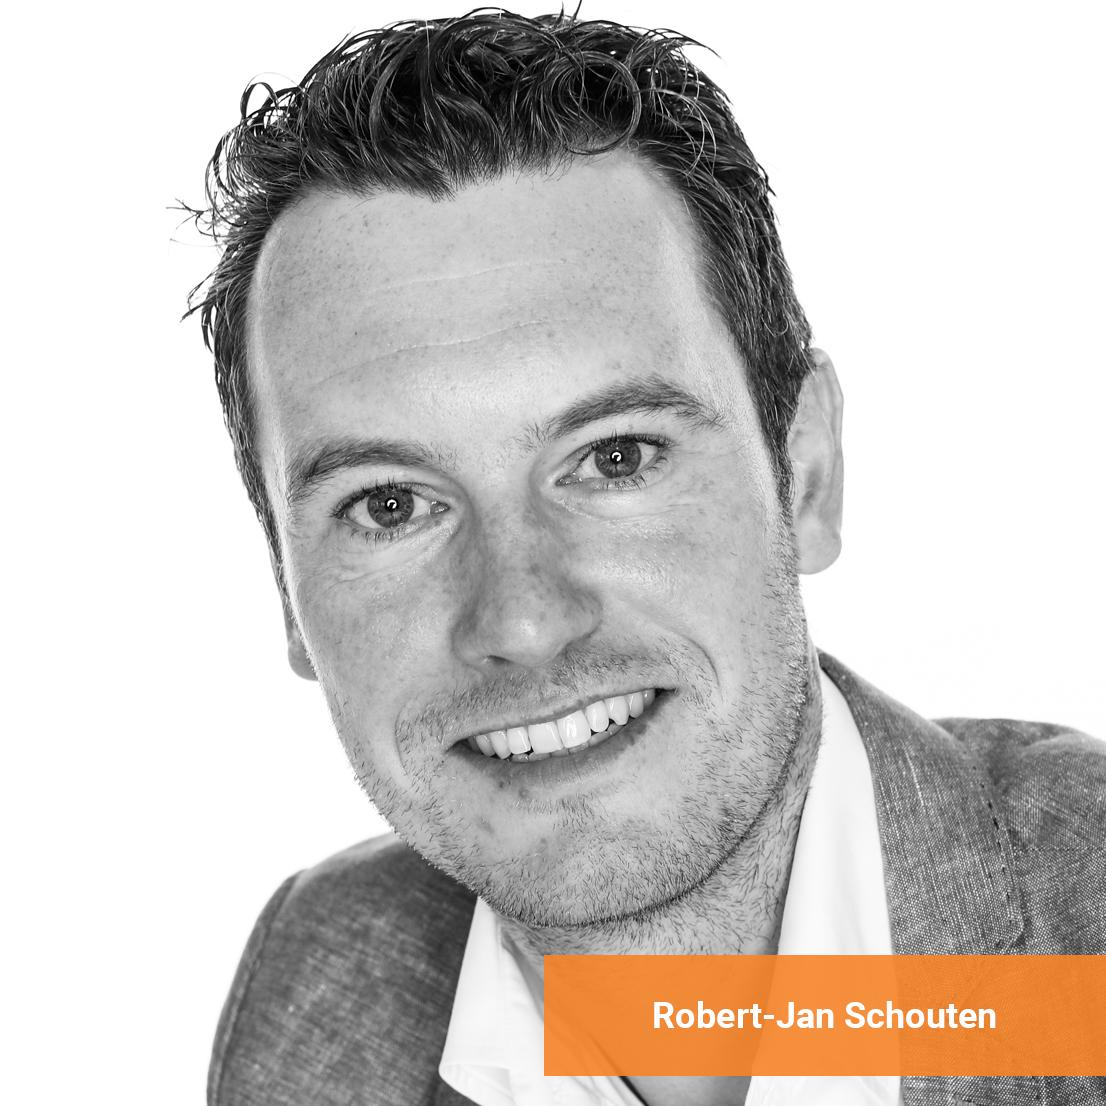 Robert-Jan Schouten